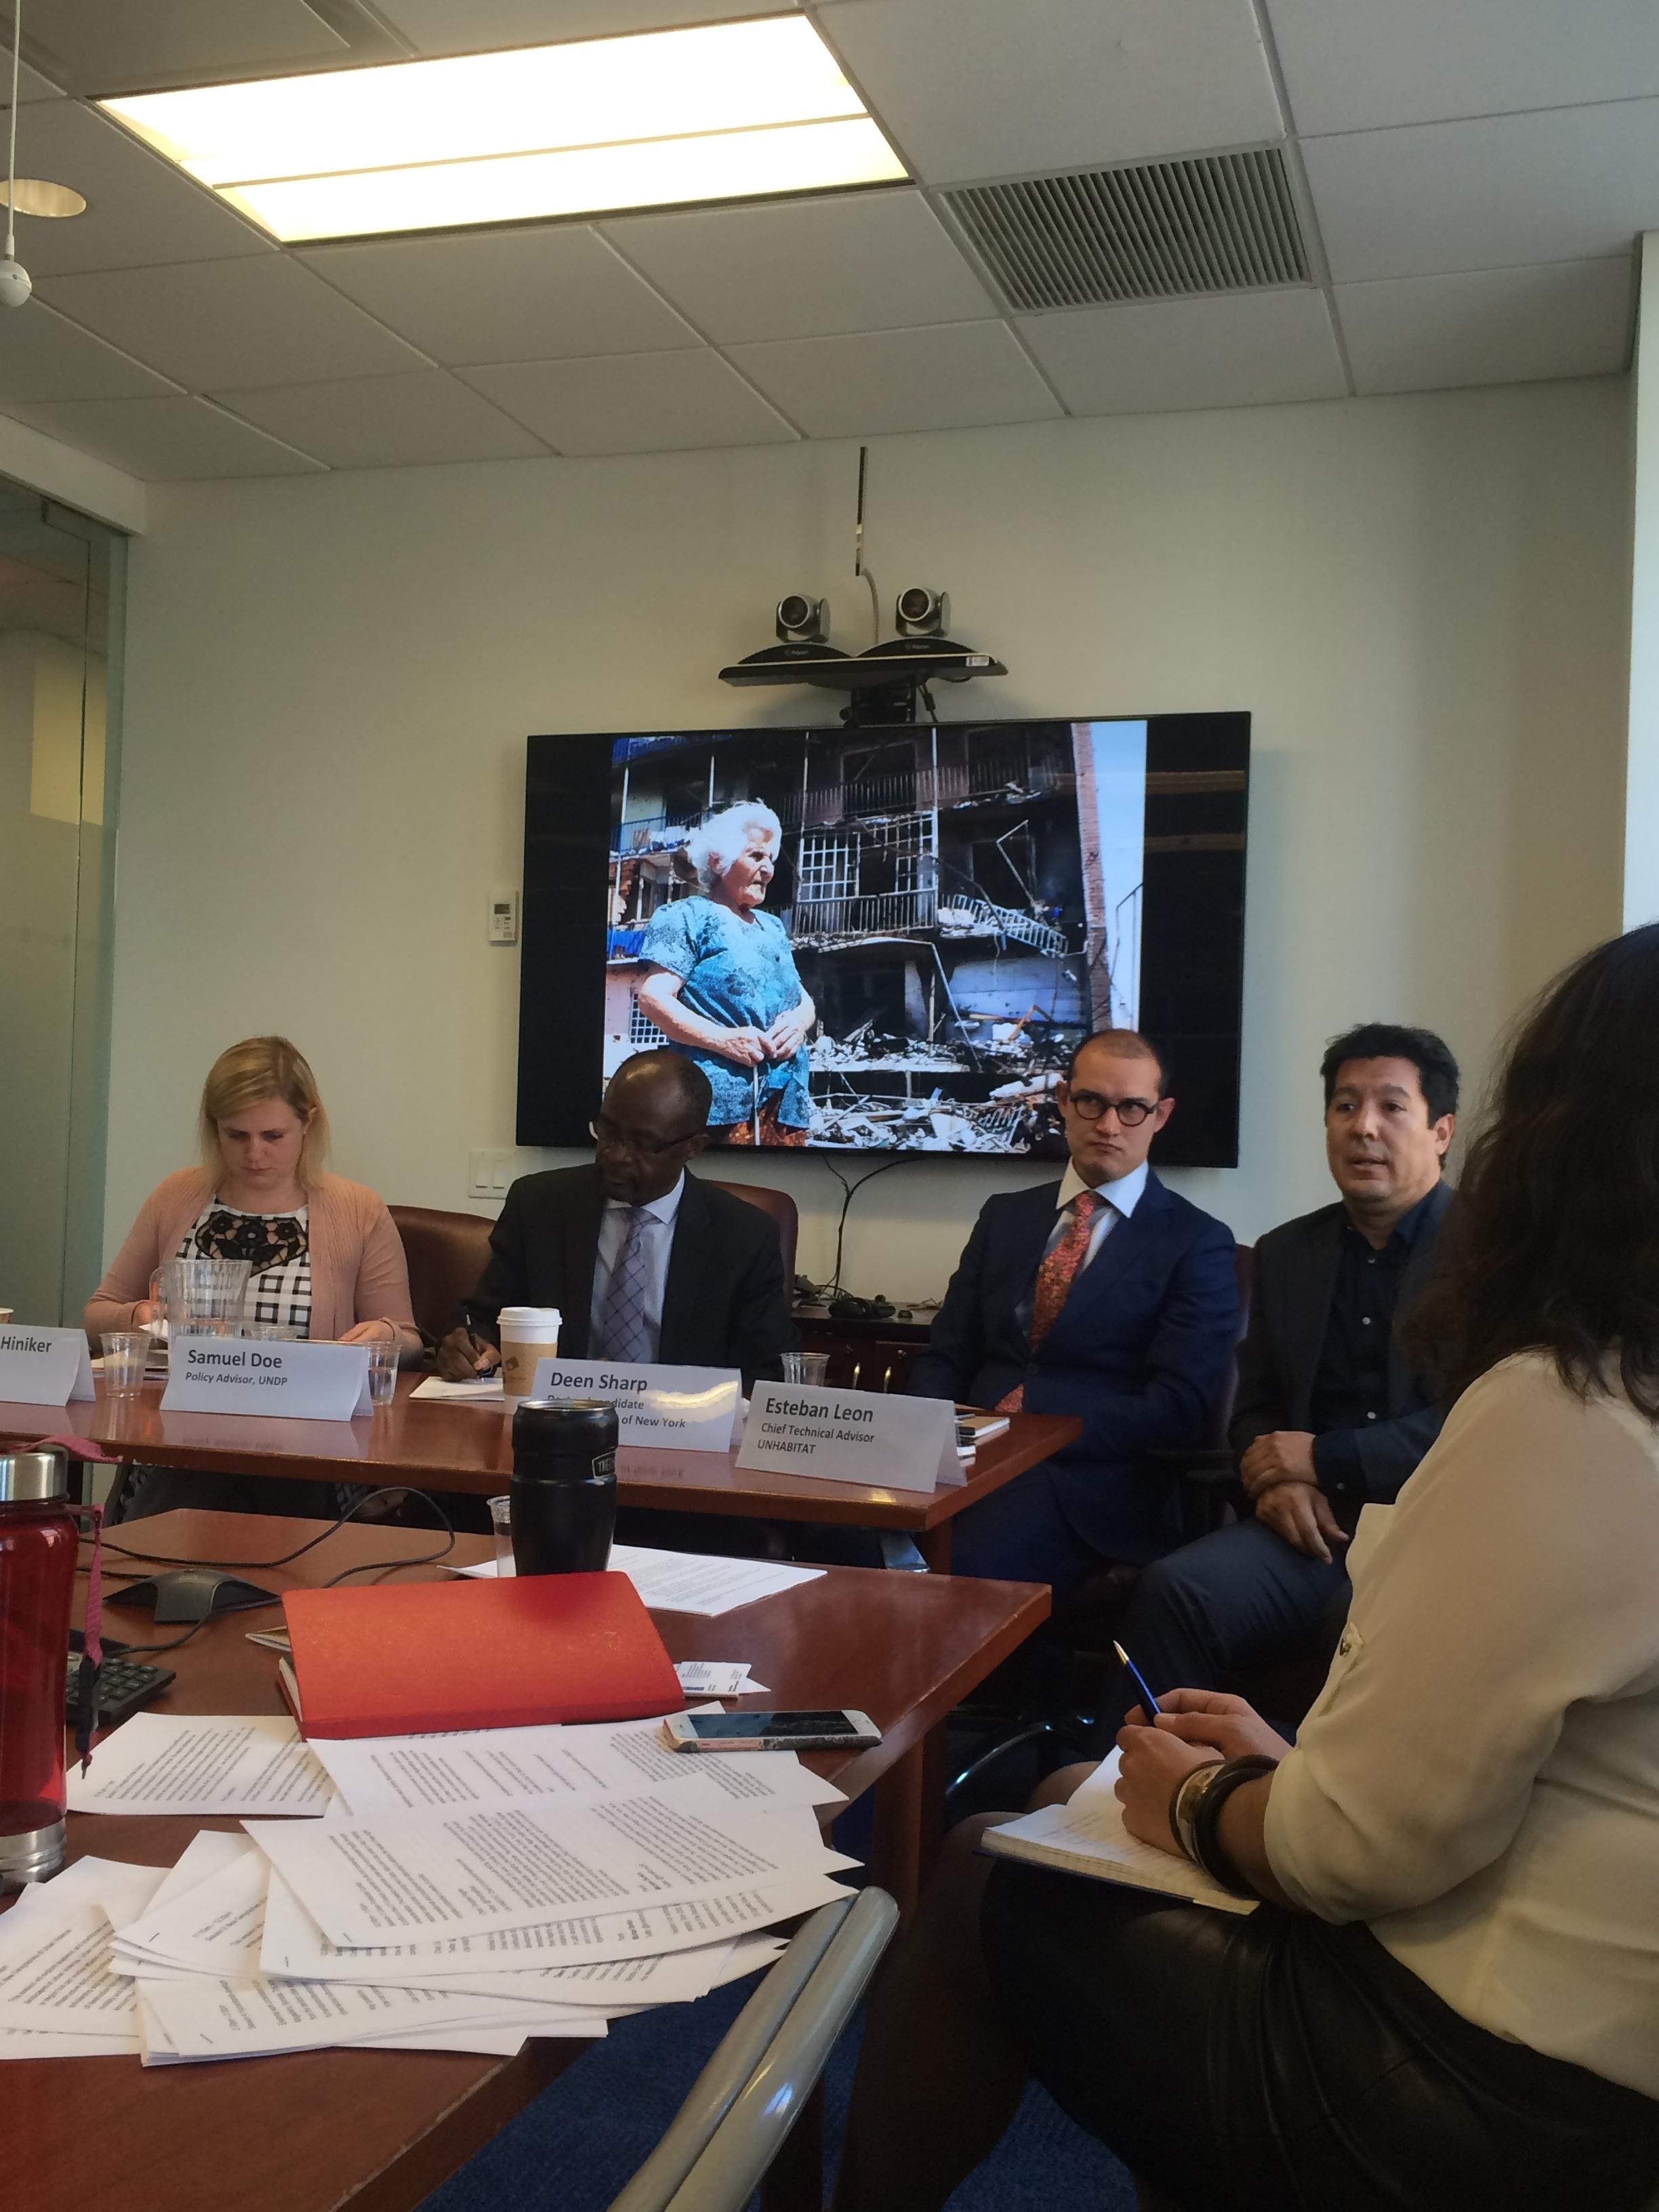 Panel II 'New Geographies of Urban Violence' (L-R)Alexandra Hiniker,PAX representative to the UN;Samuel Doe, Policy Advisor, UNDP; Deen Sharp, Doctoral candidate at the City University of New York;Esteban Leon,Chief Technical Advisor, UNHABITAT. Photo: Reem Aliessa